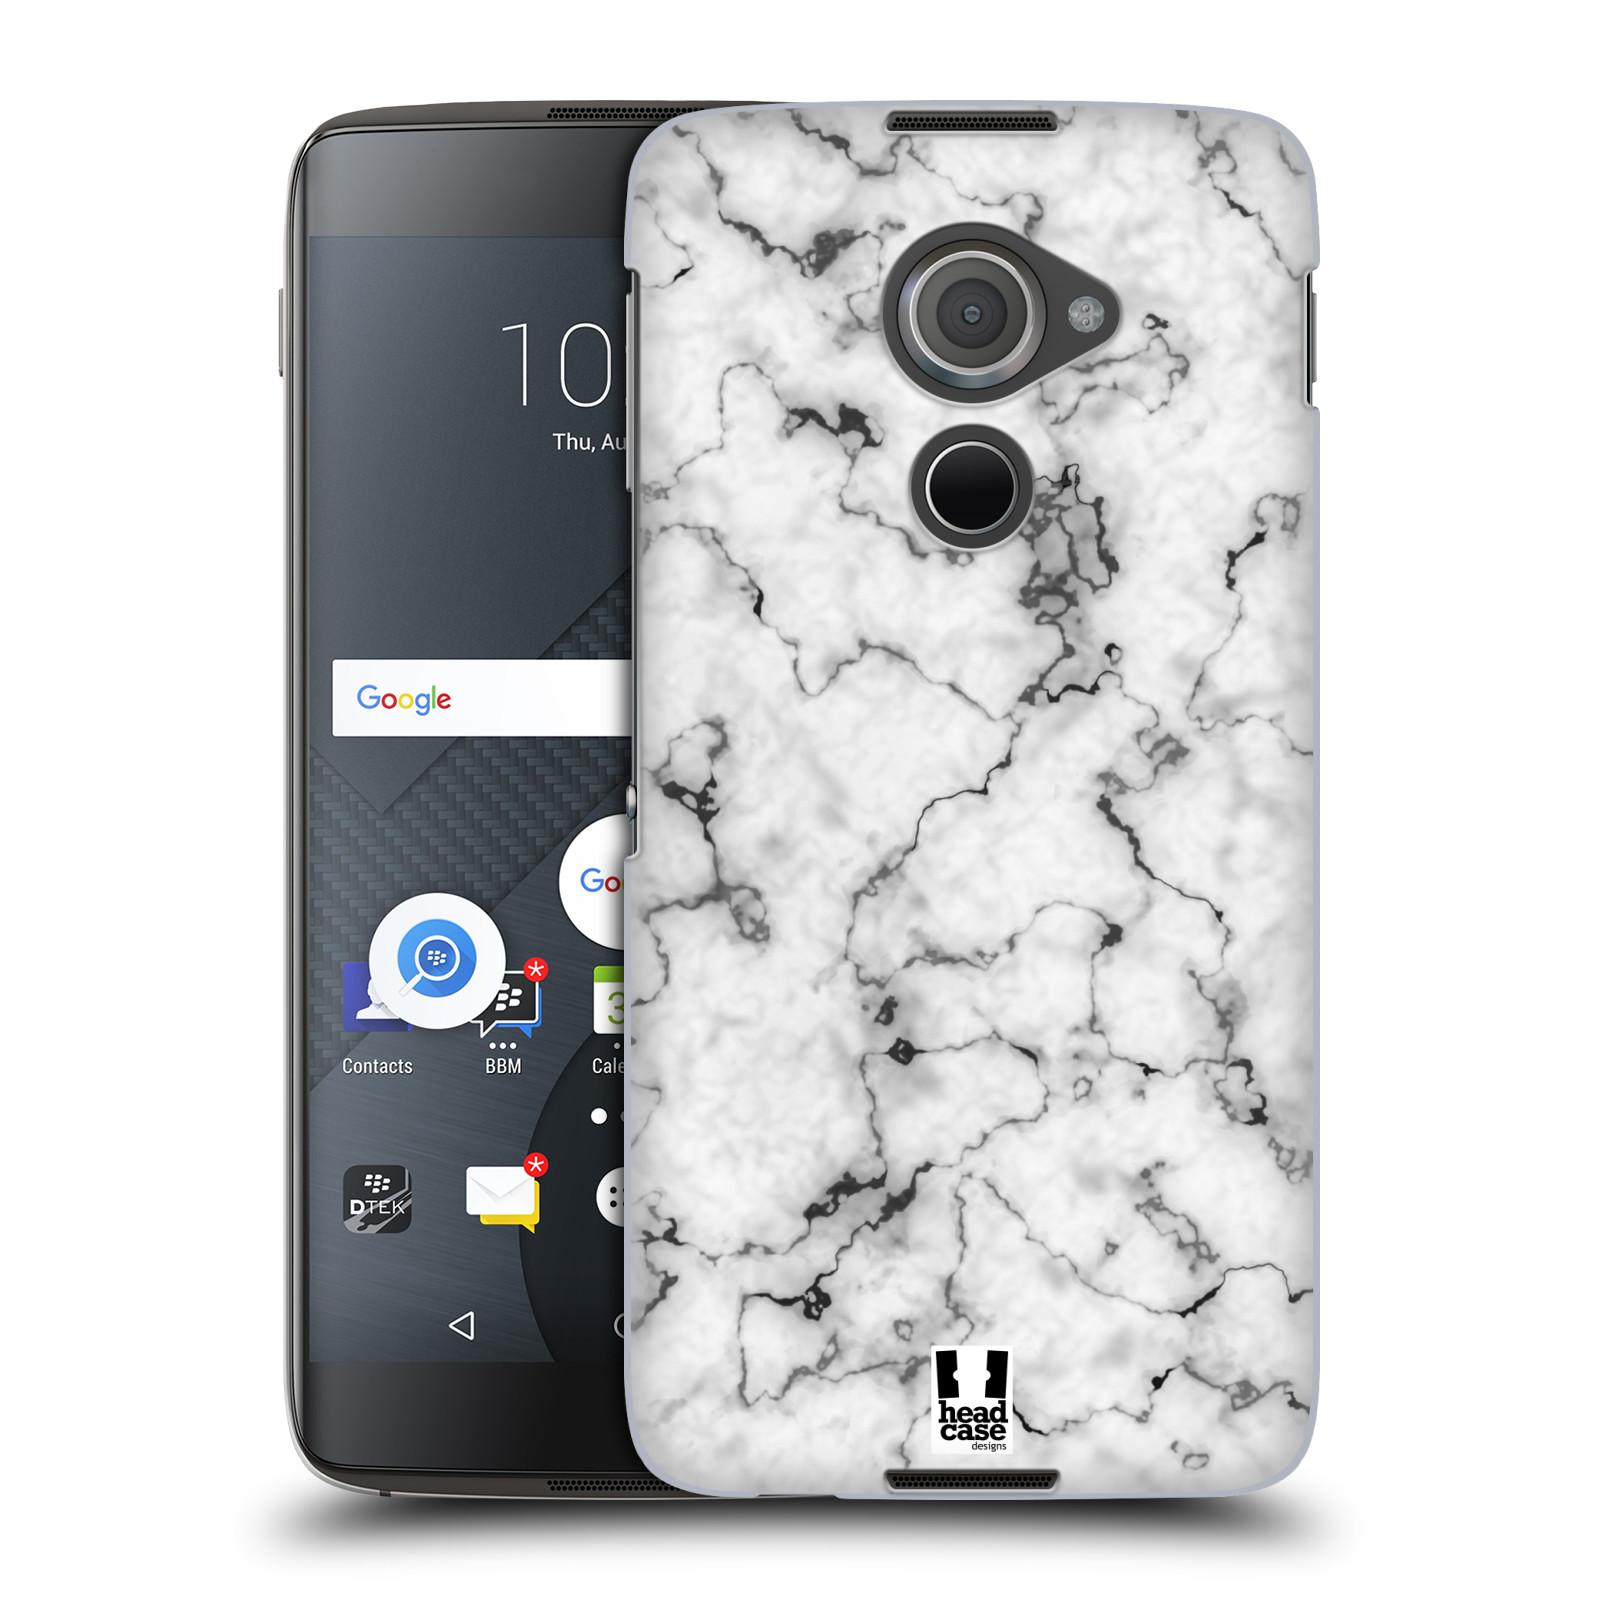 Plastové pouzdro na mobil Blackberry DTEK60 (Argon) - Head Case - Bílý mramor